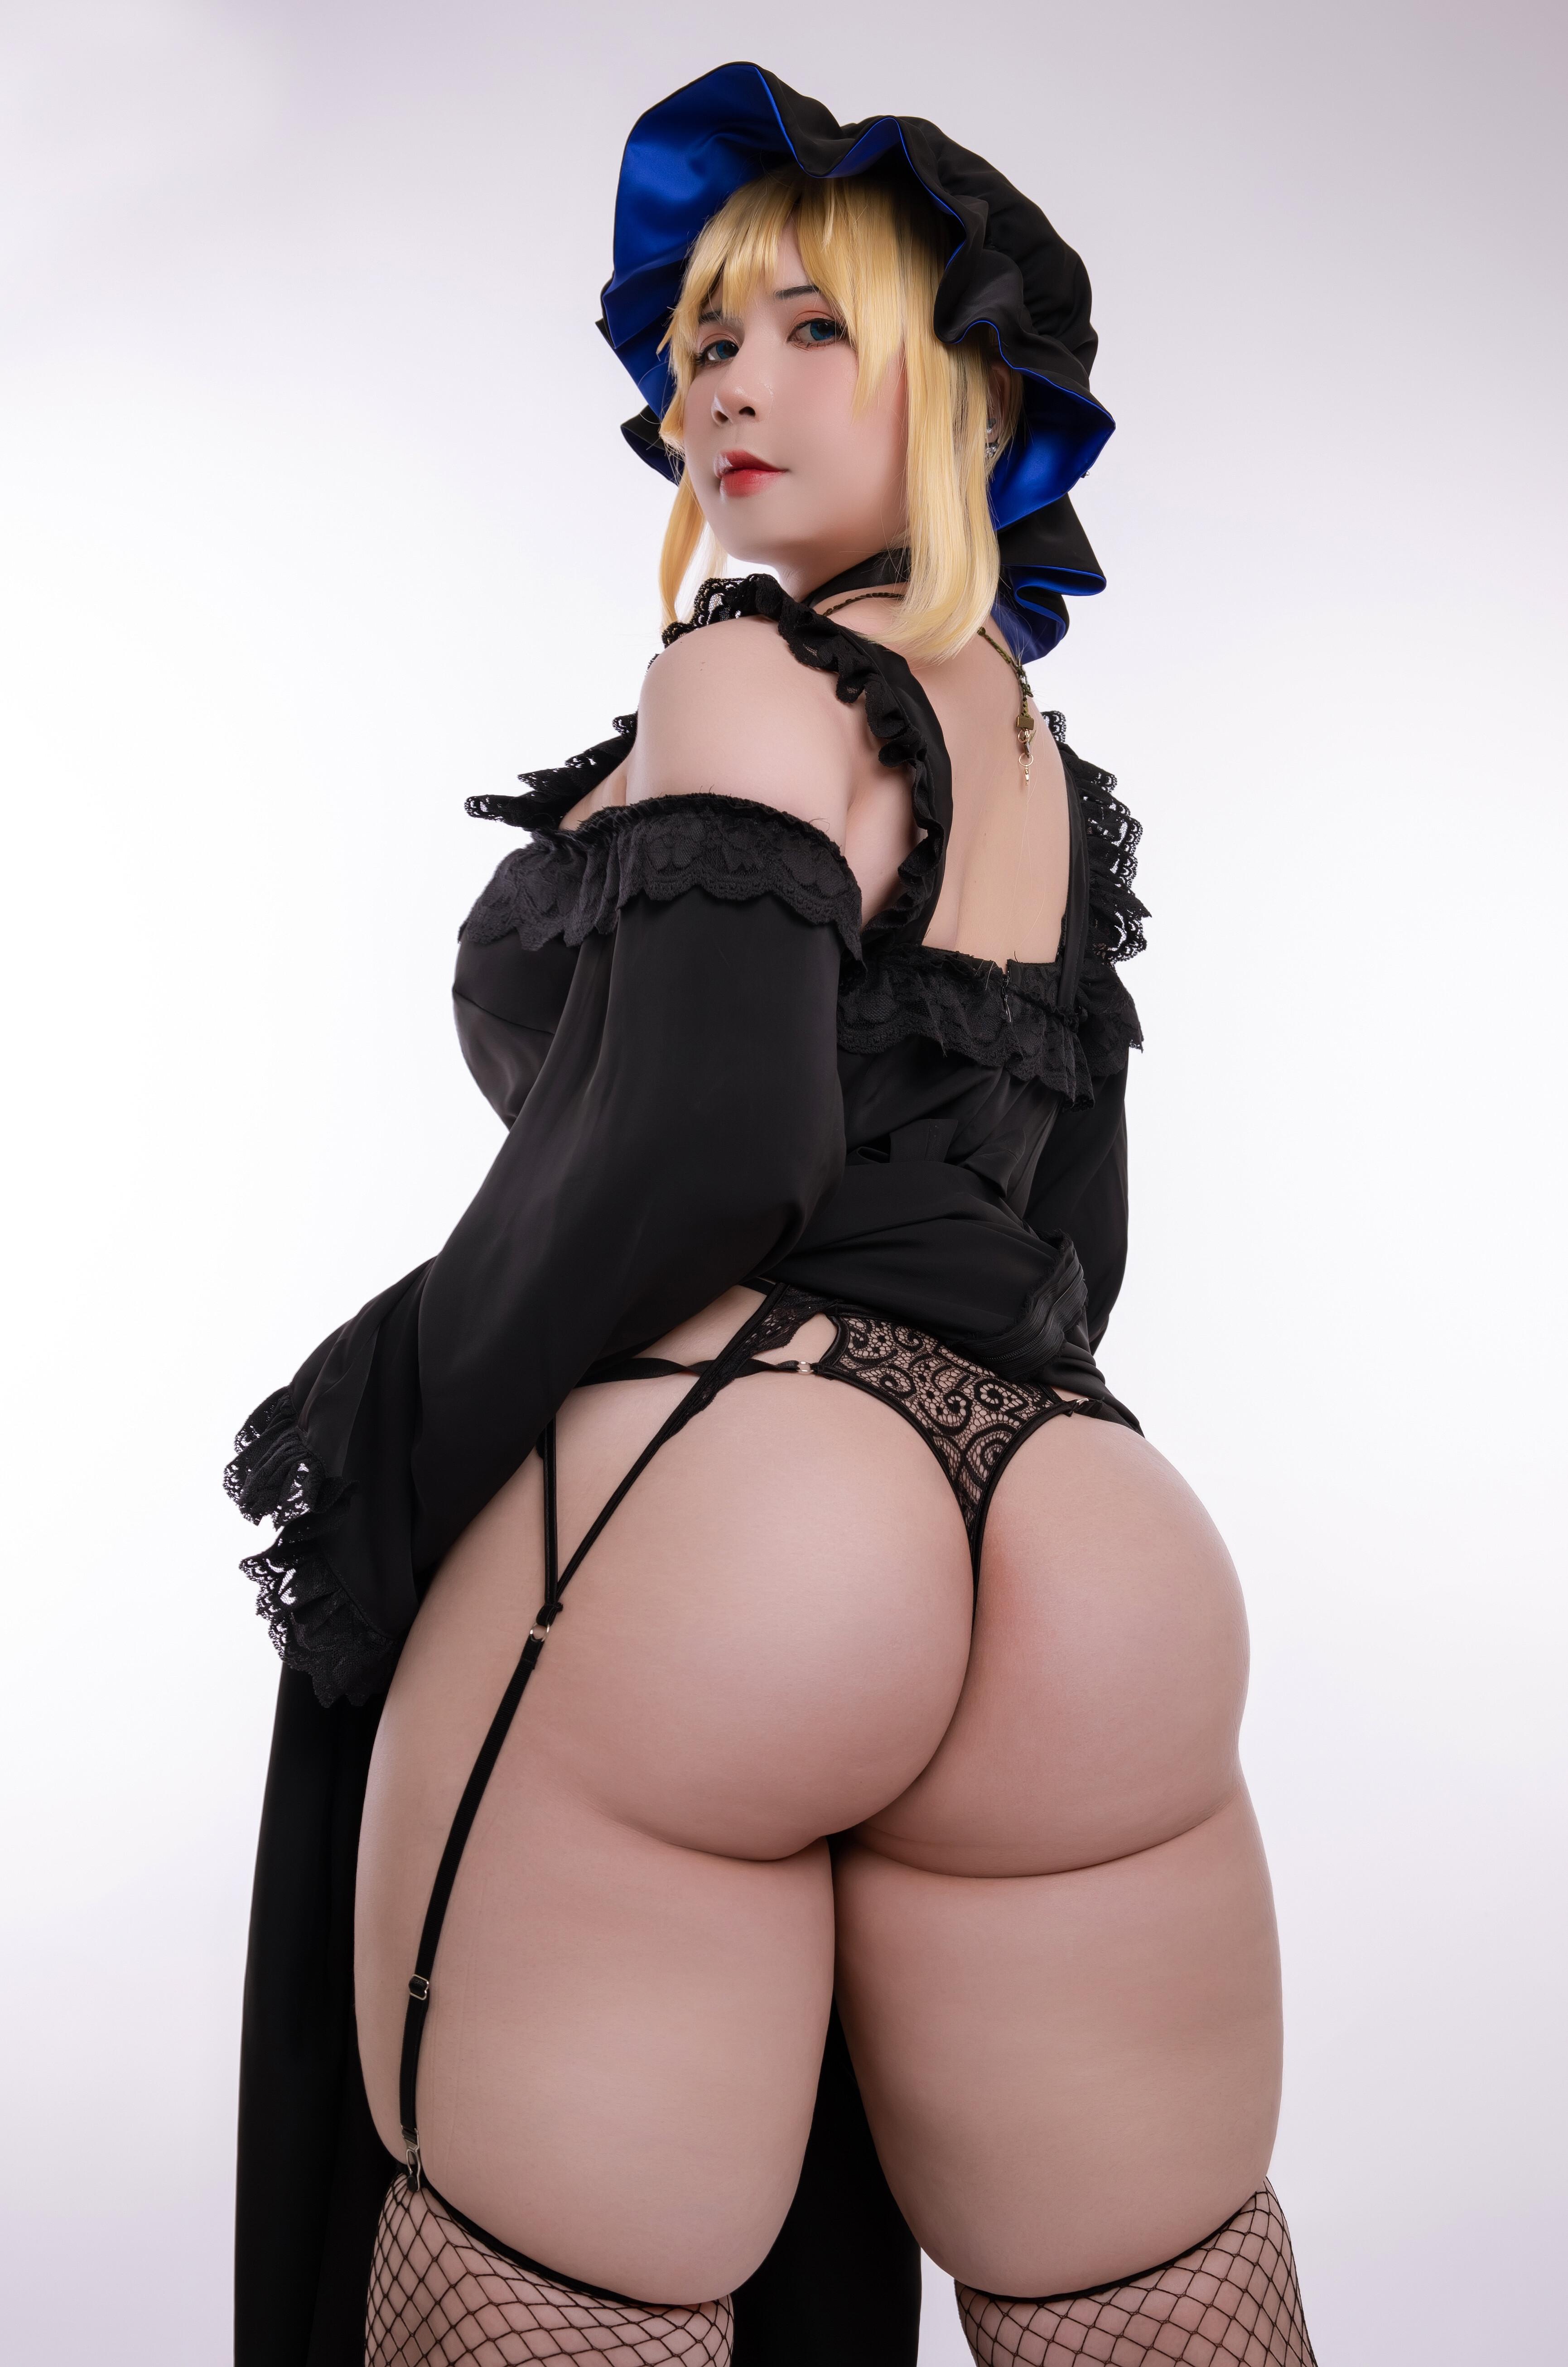 Alice maid